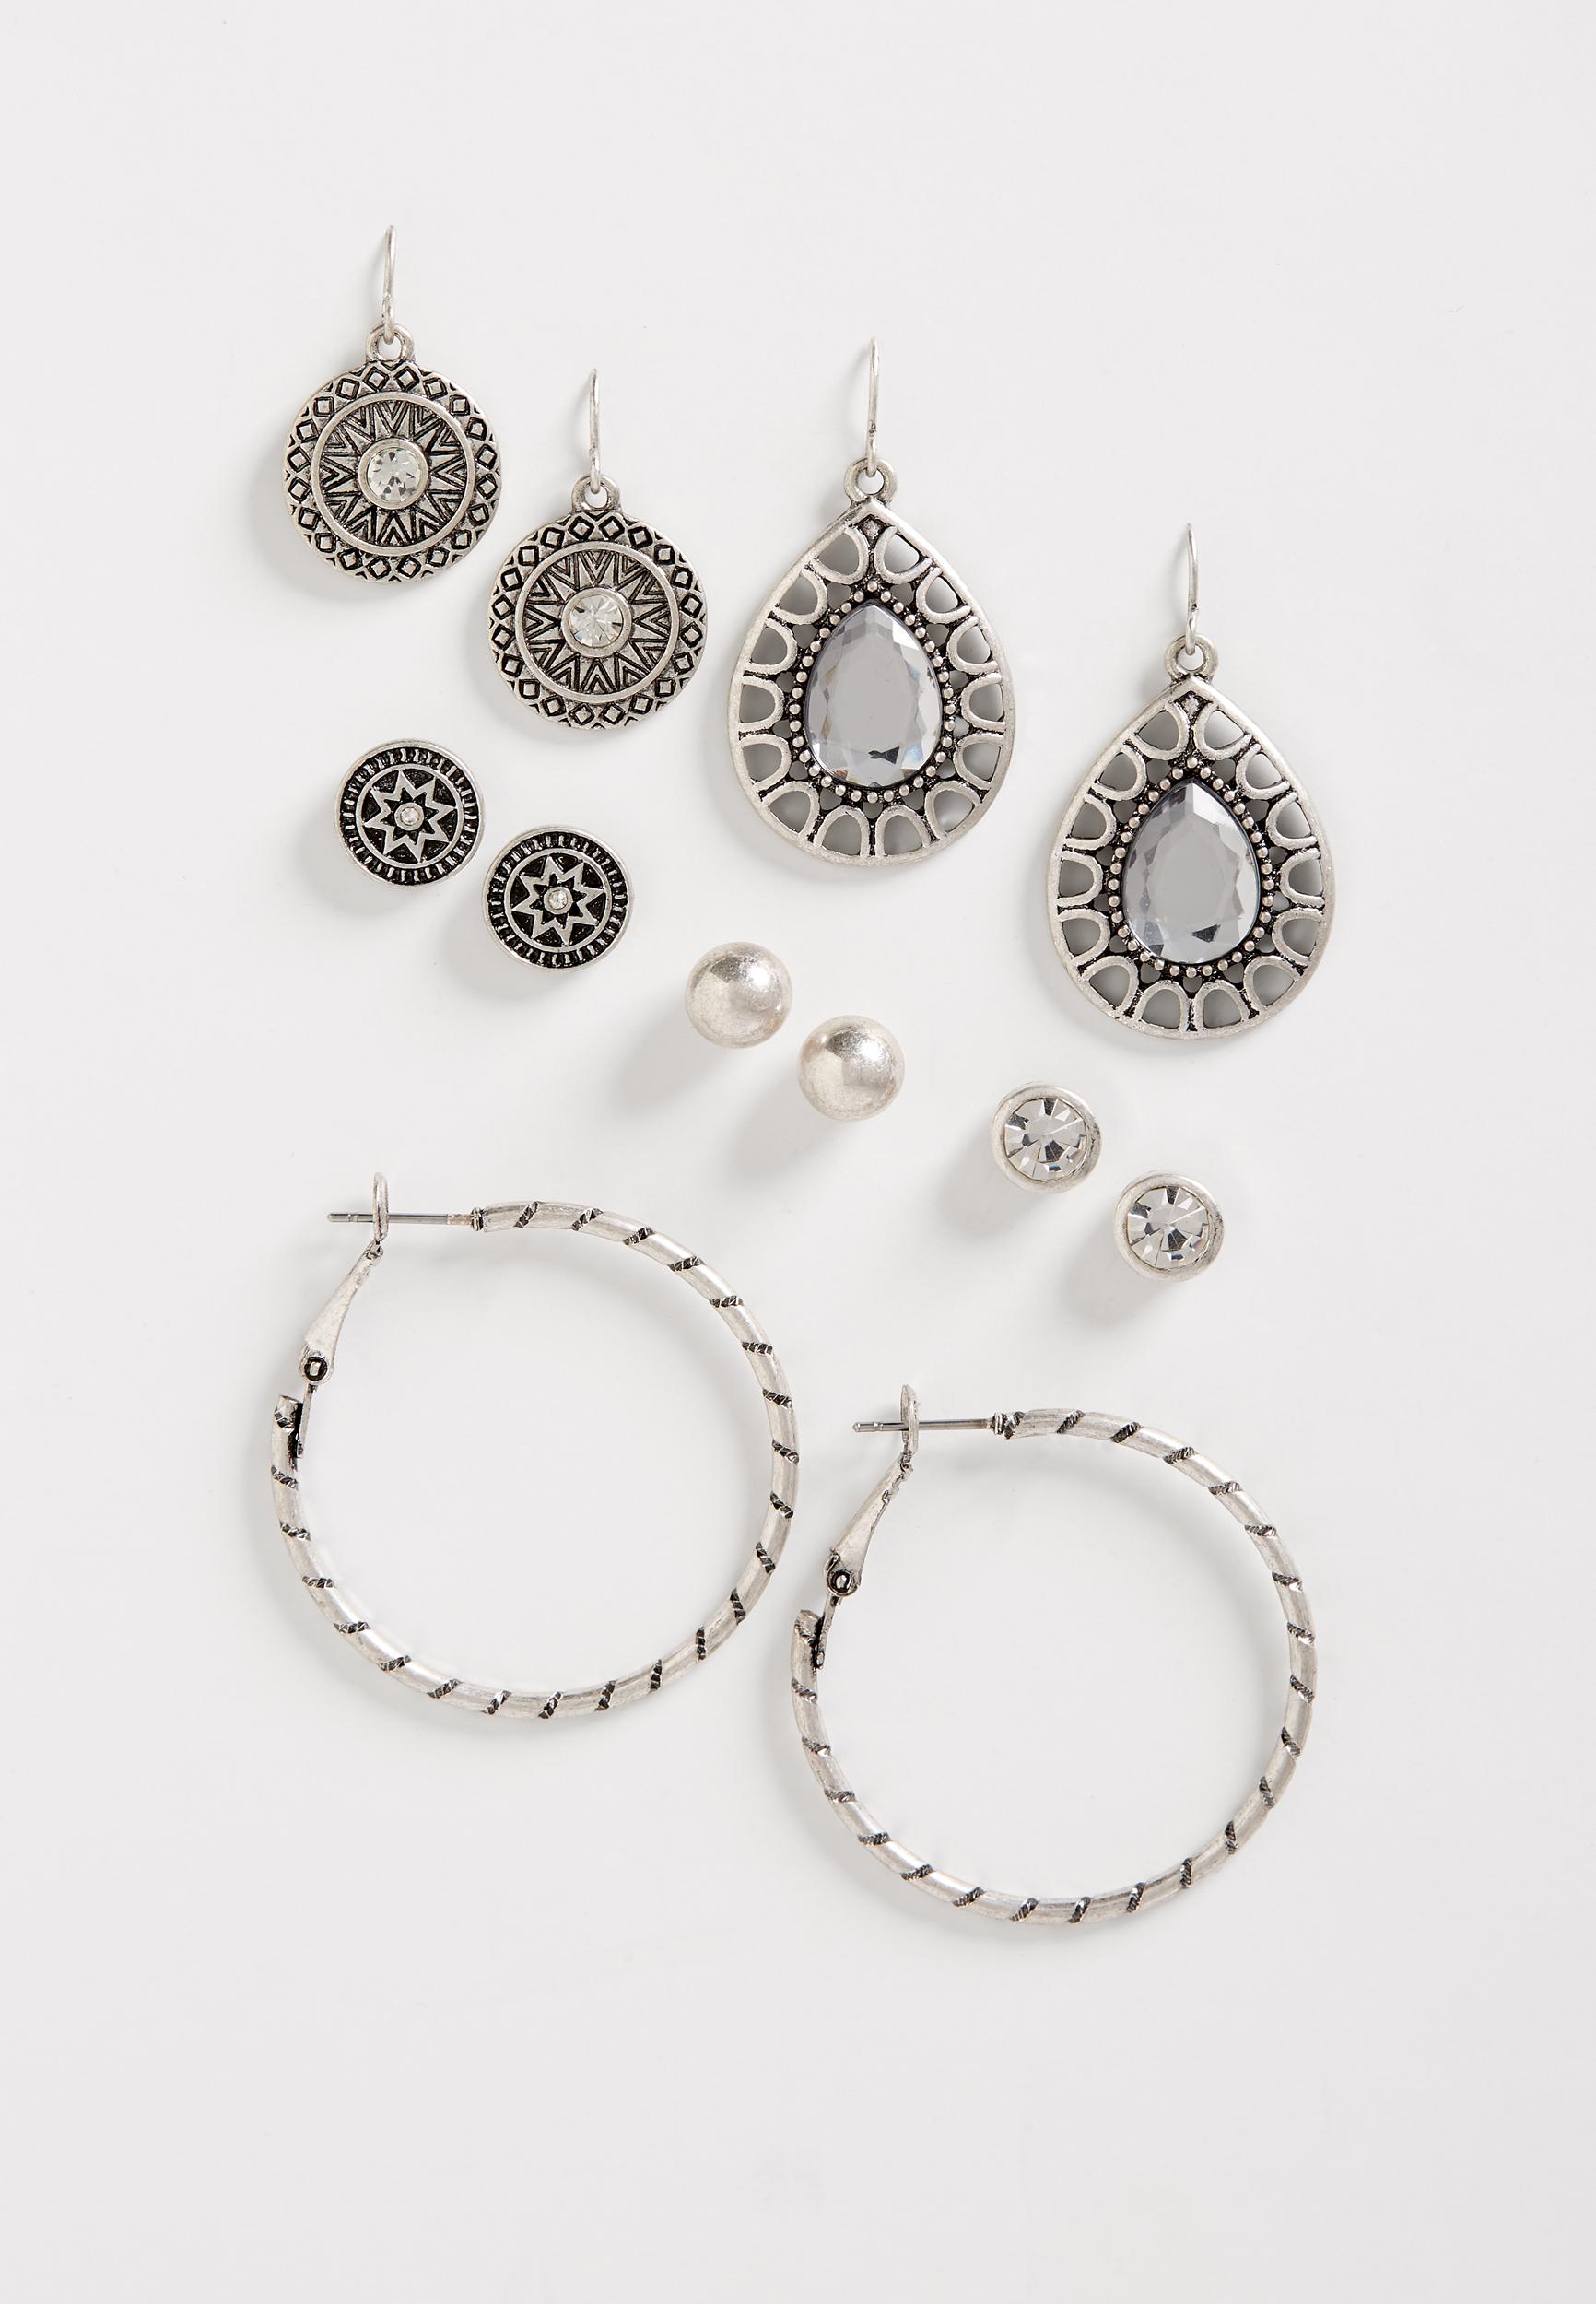 Maurices Silver Hoop Earring Set pTqj7dZm